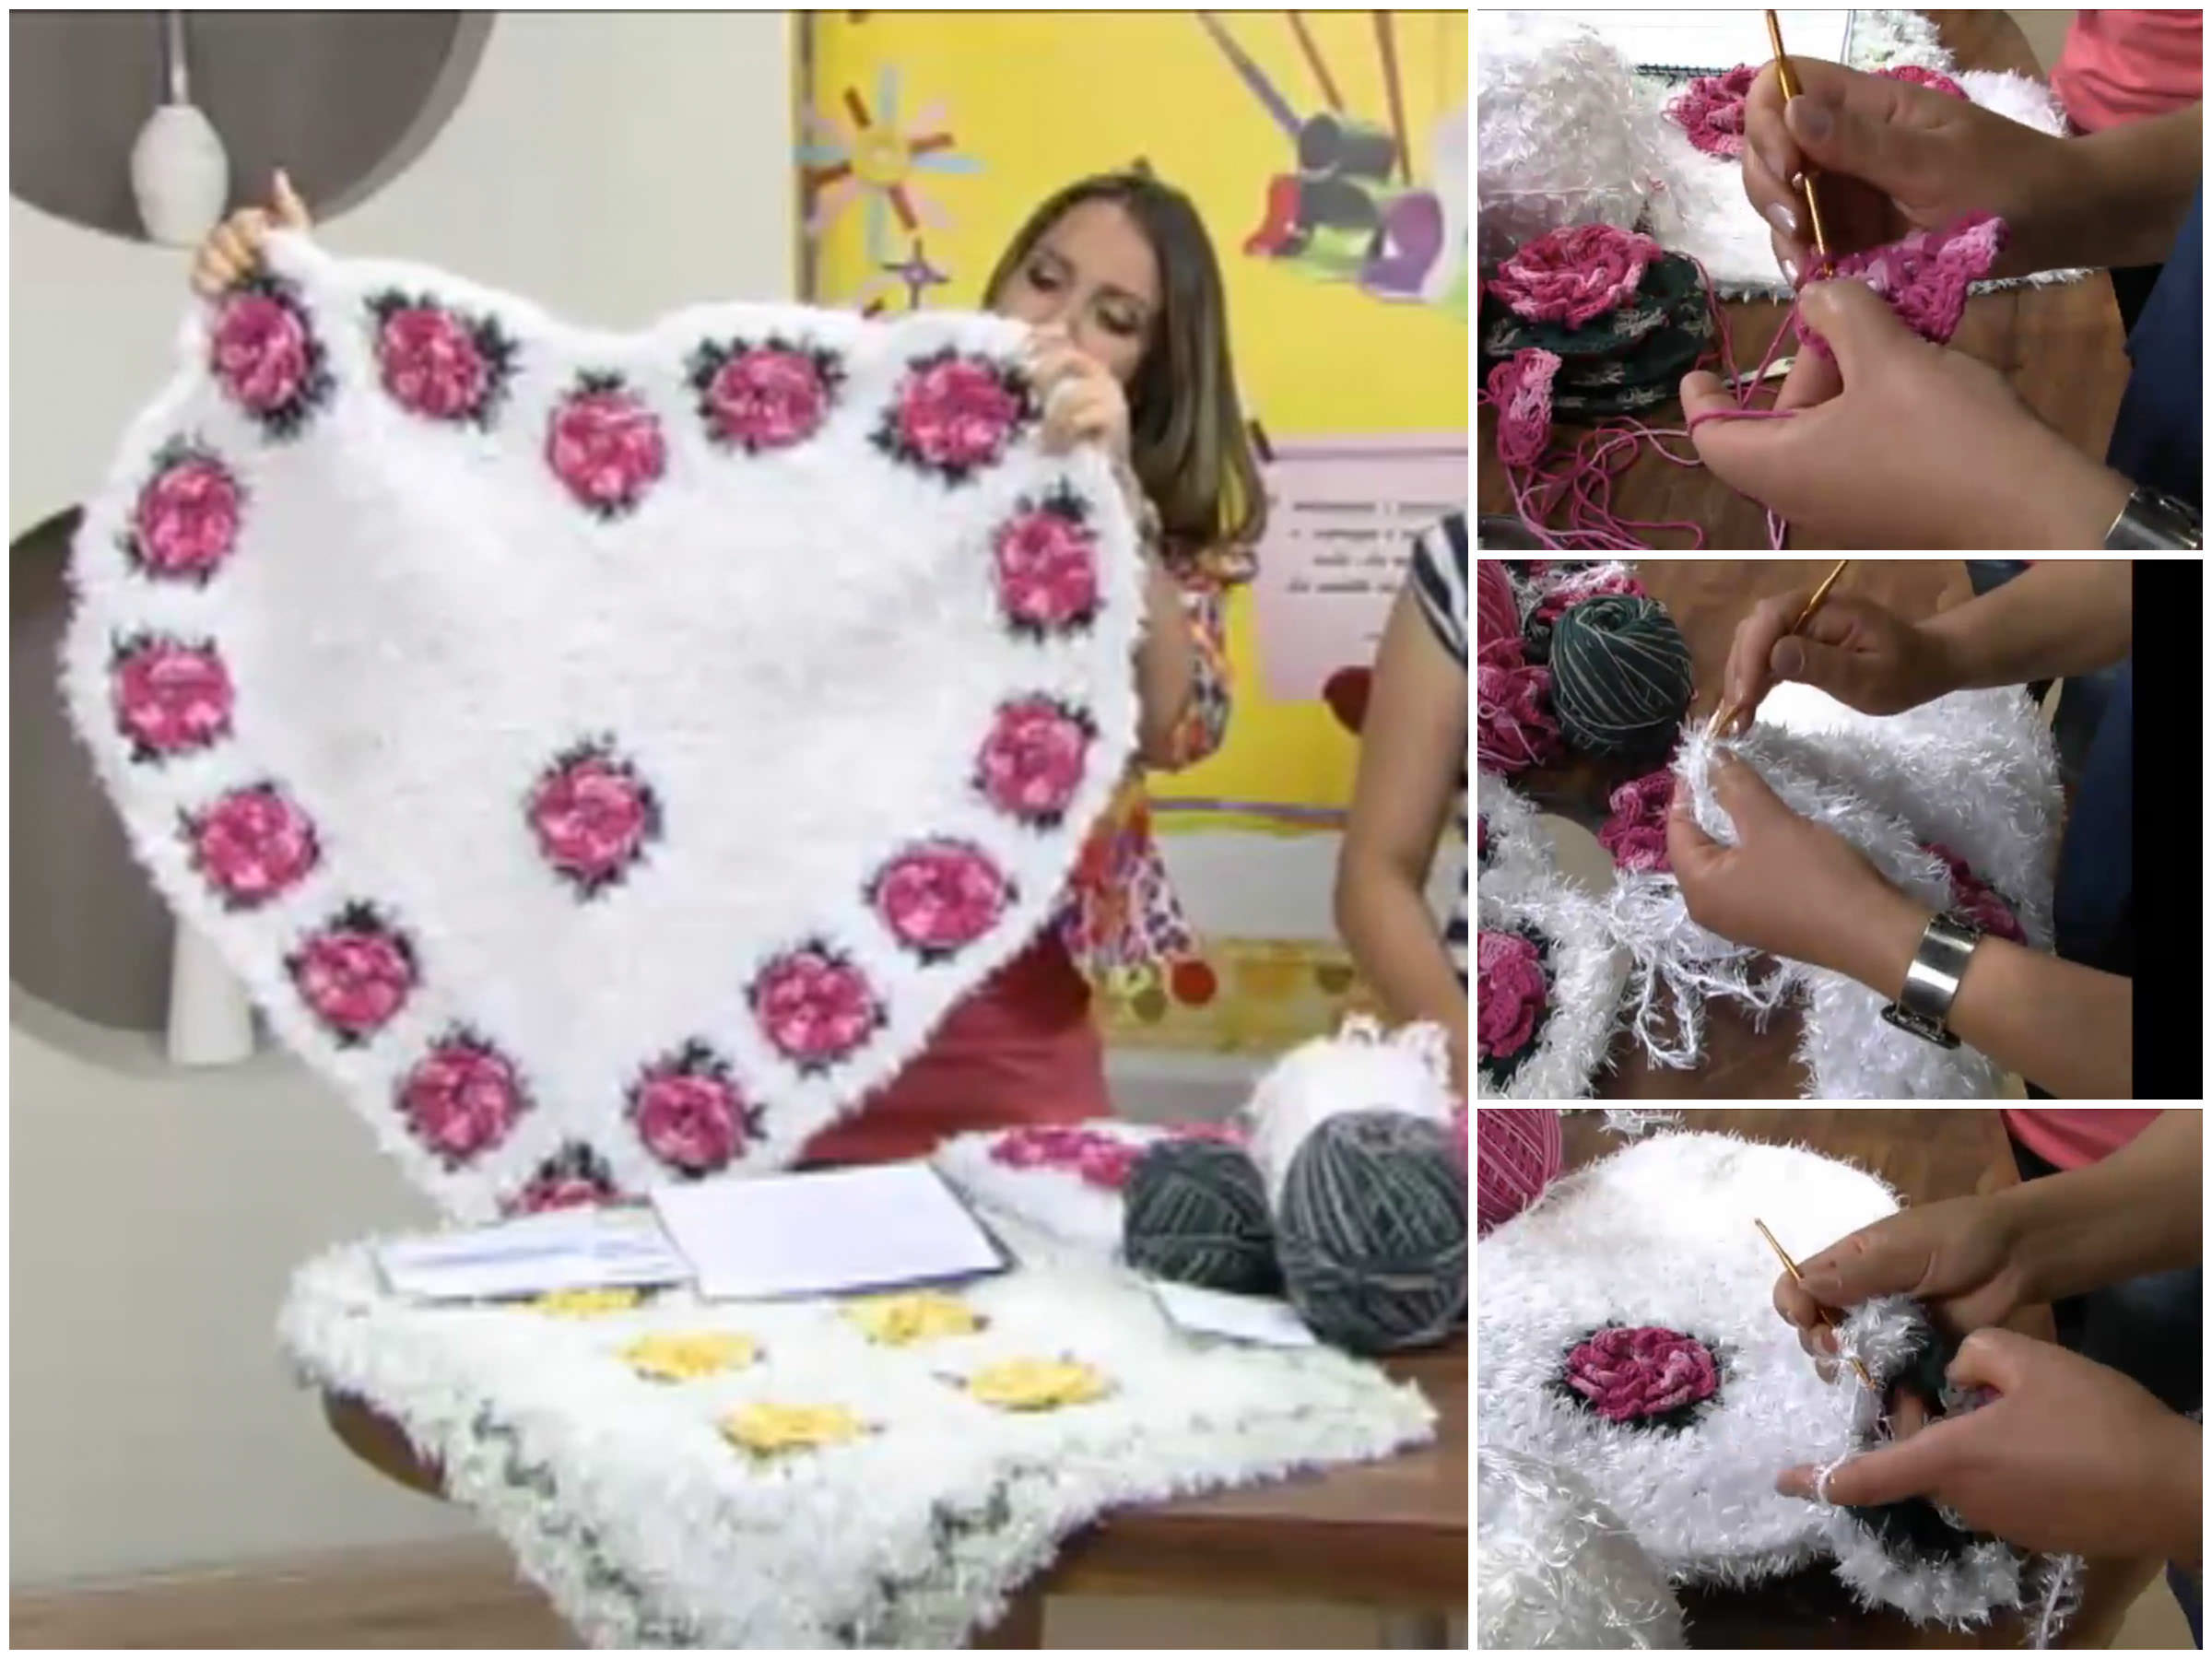 Crochet Heart Shaped Carpet